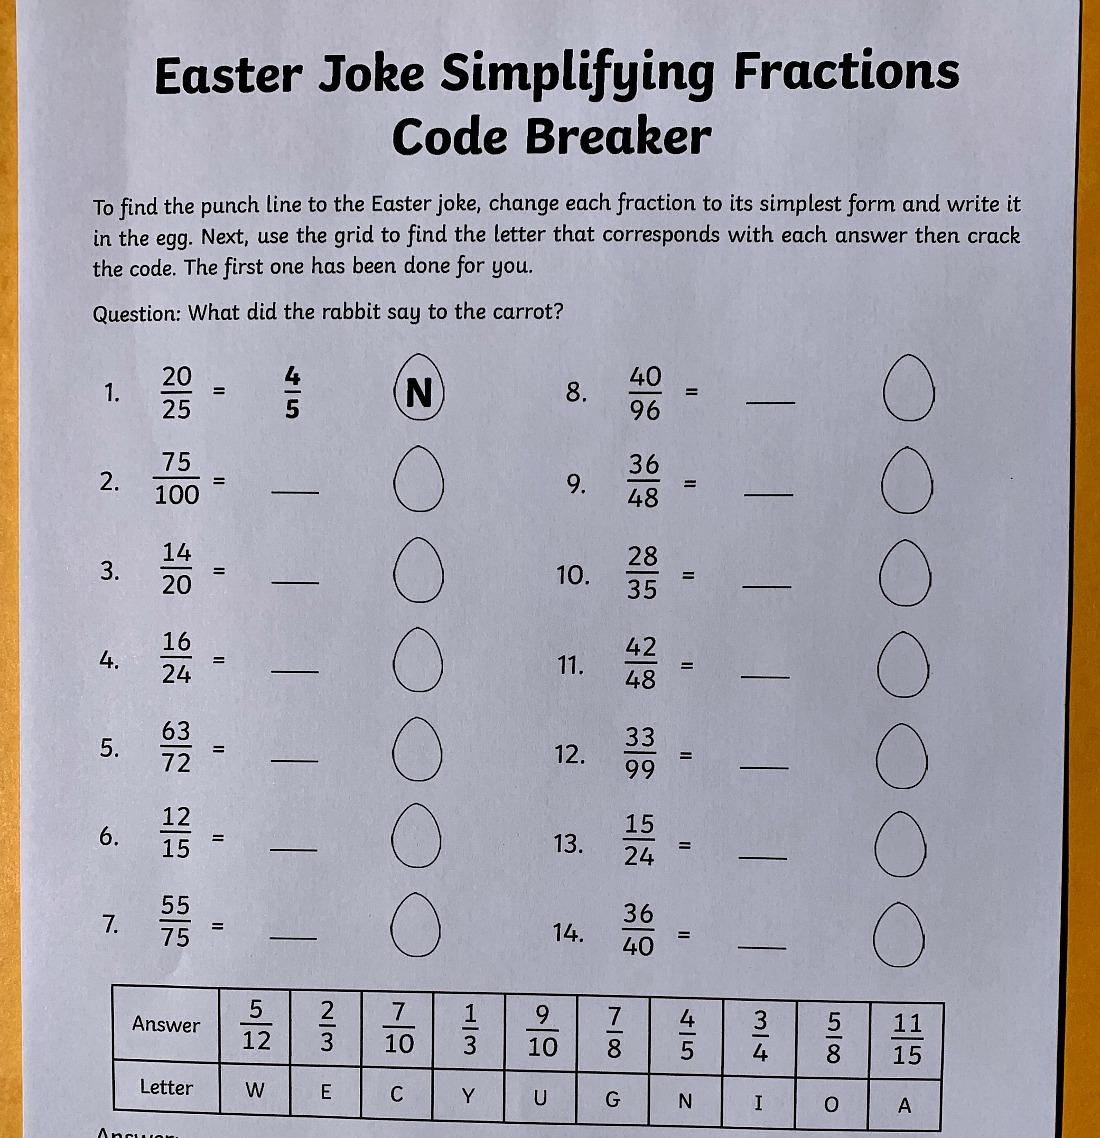 Code Breaker by simplifying fractions